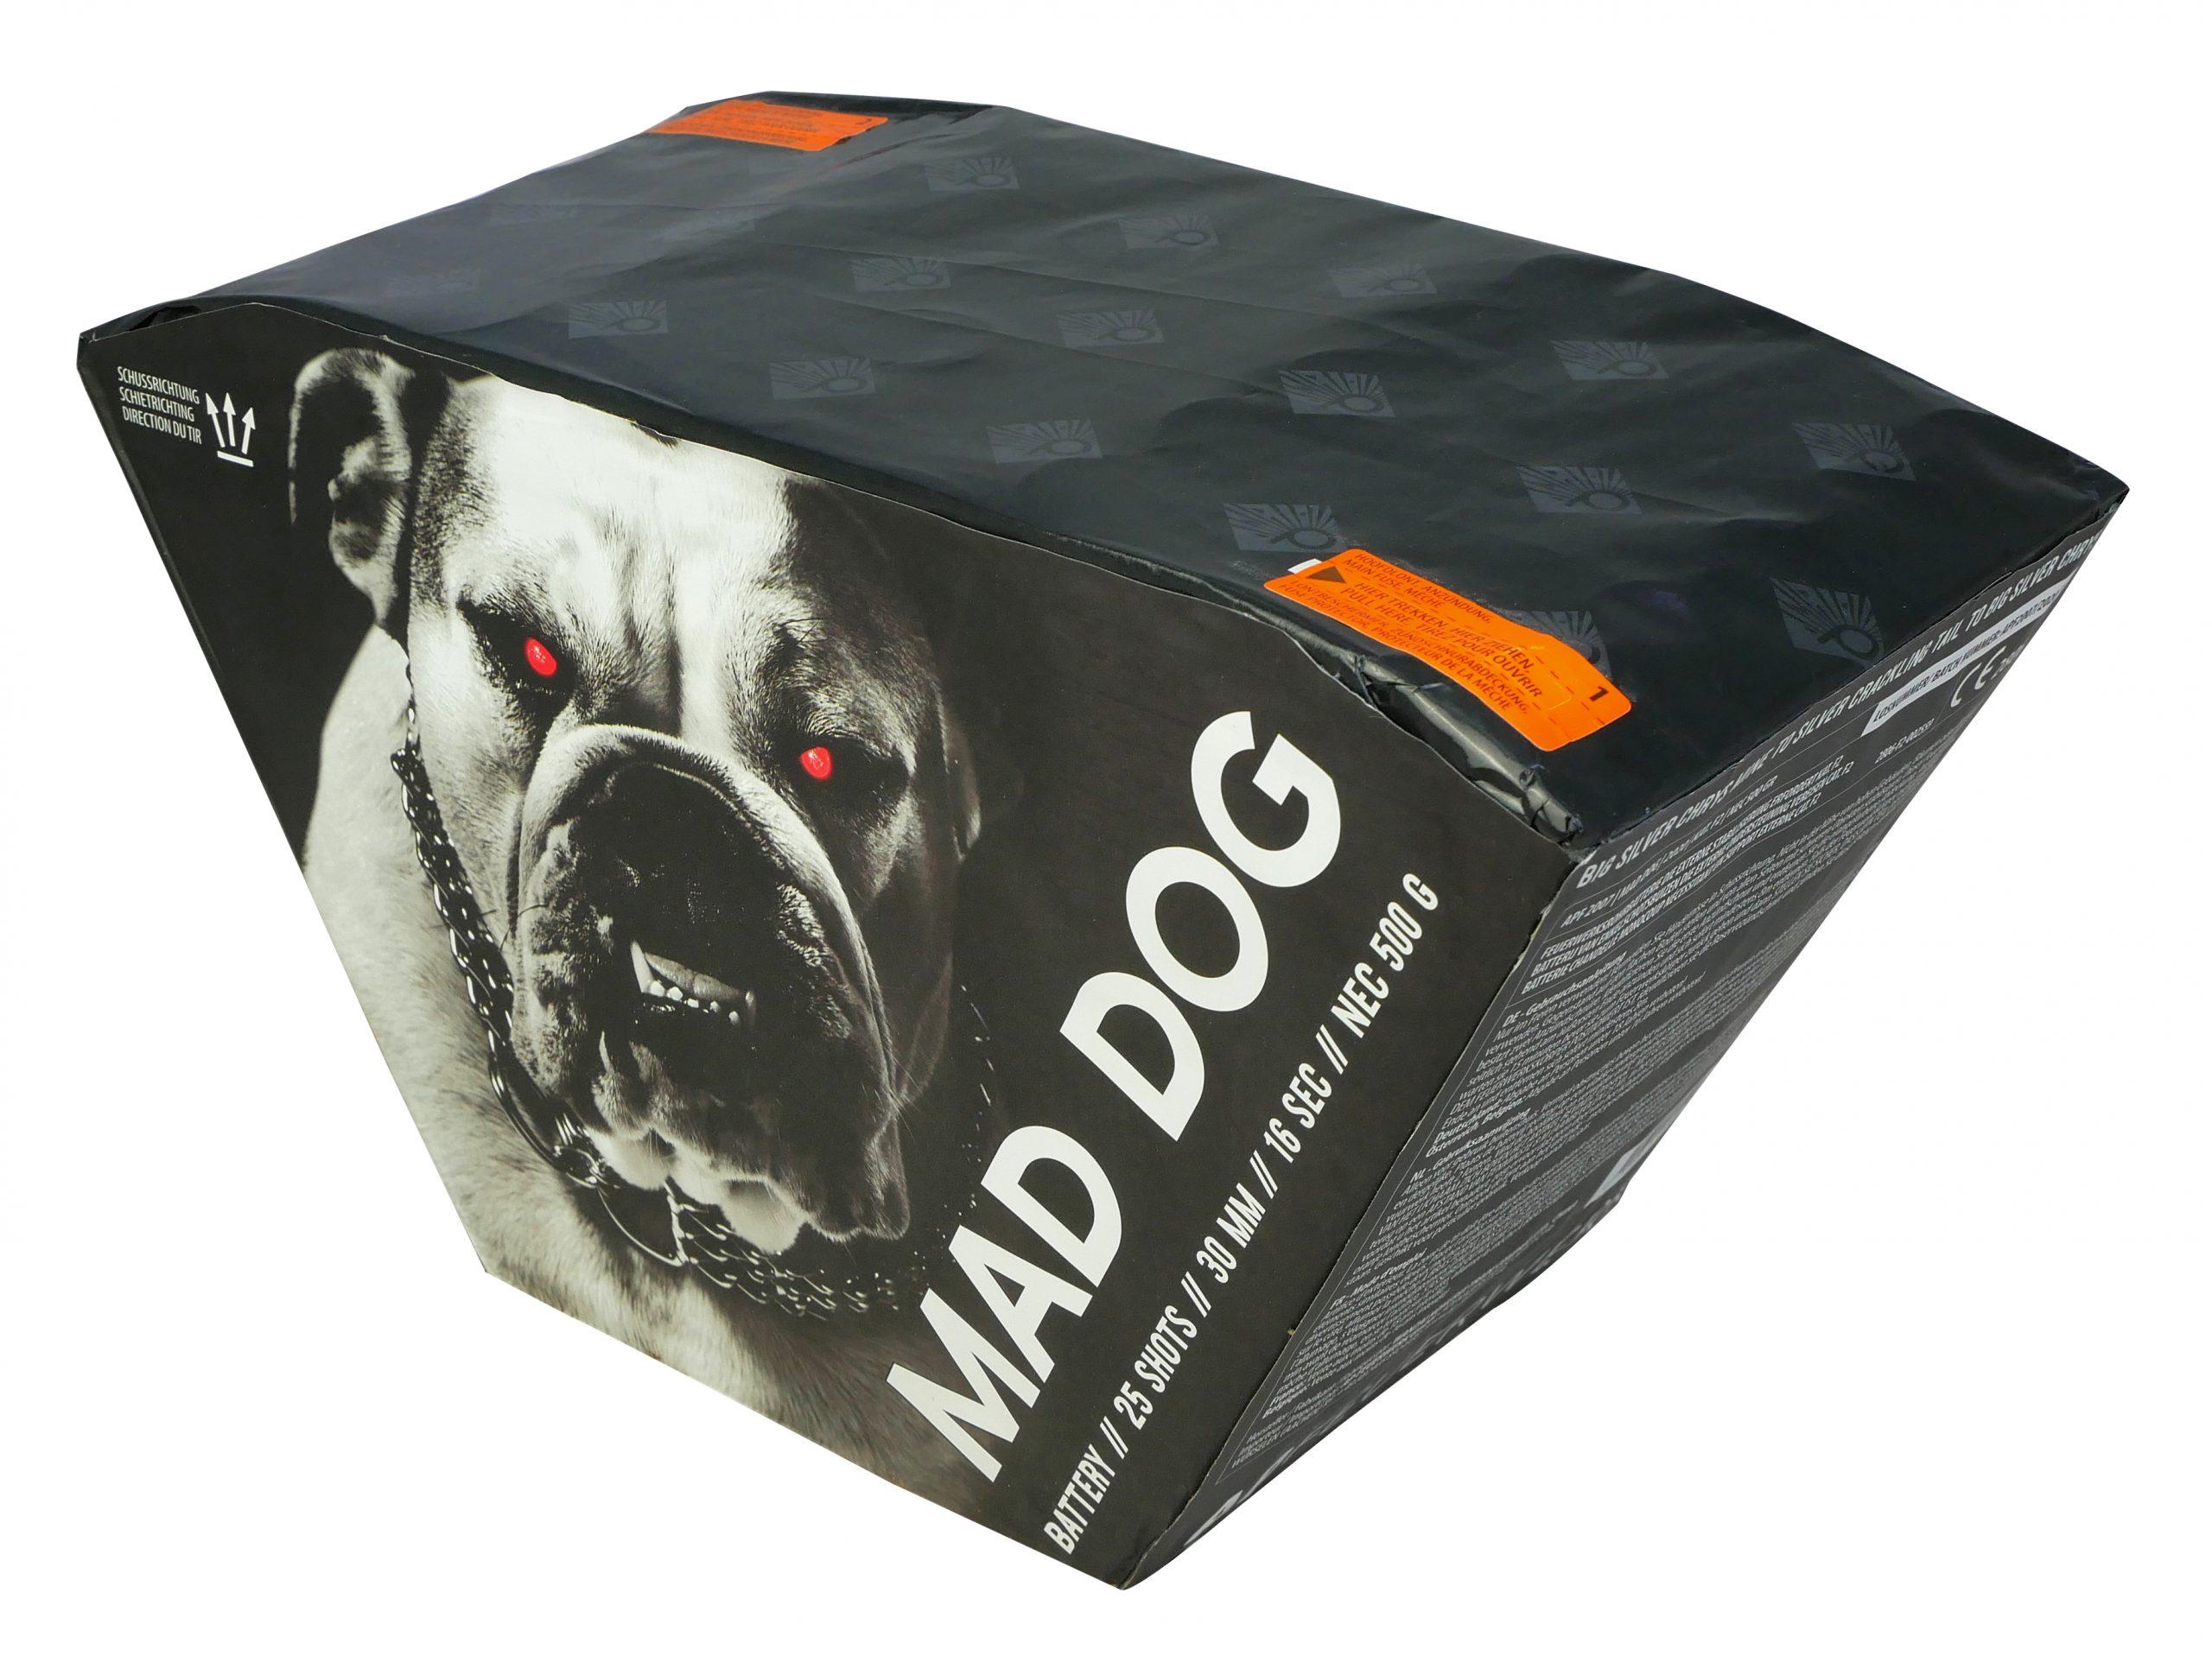 Pyrocentury Mad Dog 25 Schots Batterij